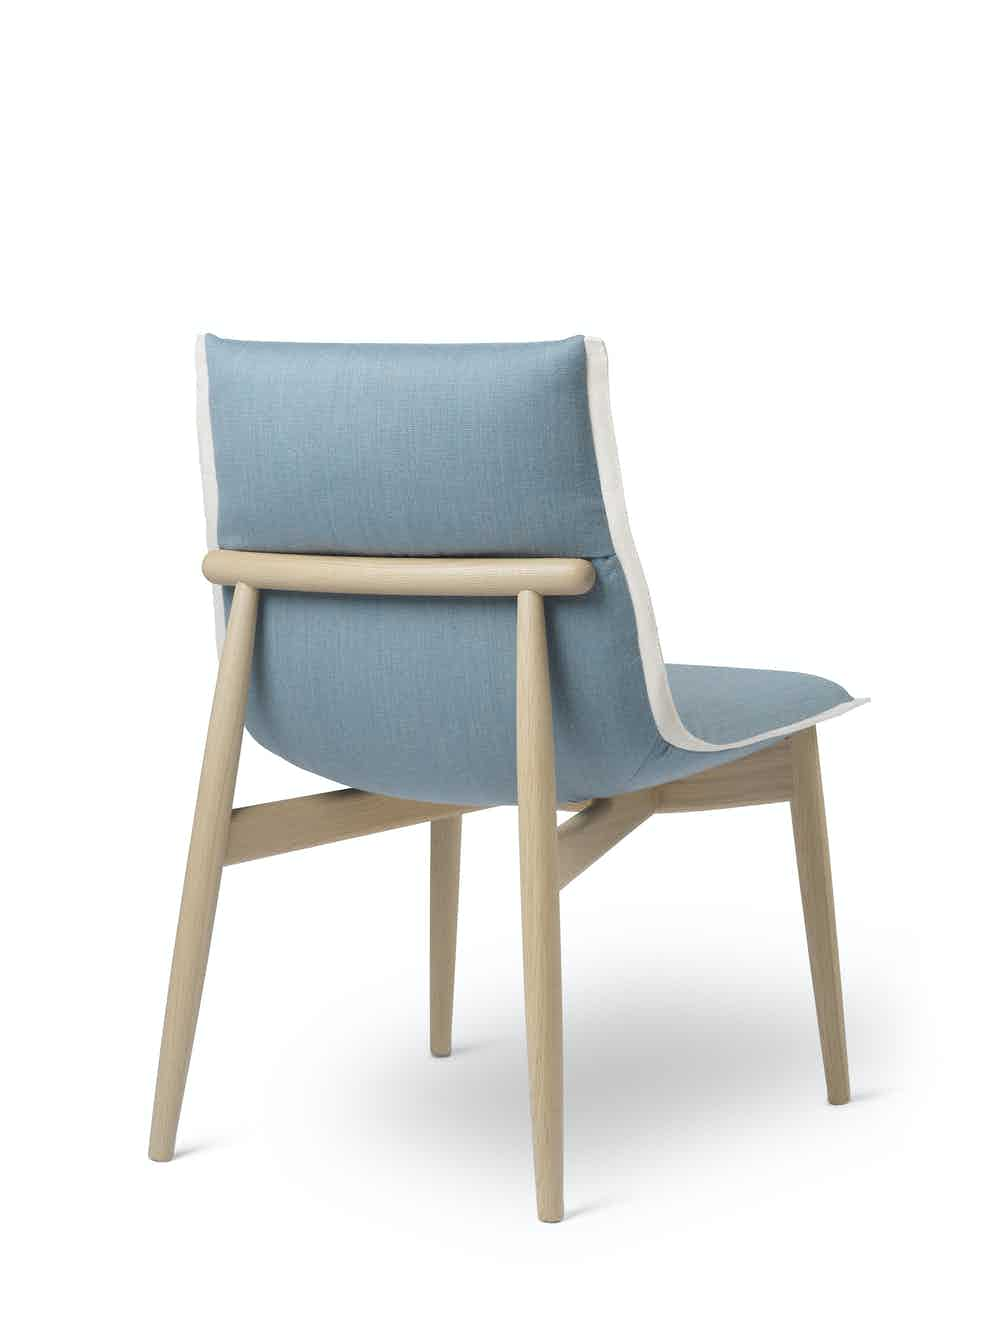 Carl-hansen-and-son-oak-blue-e004-embrace-dining-chair-back-haute-living